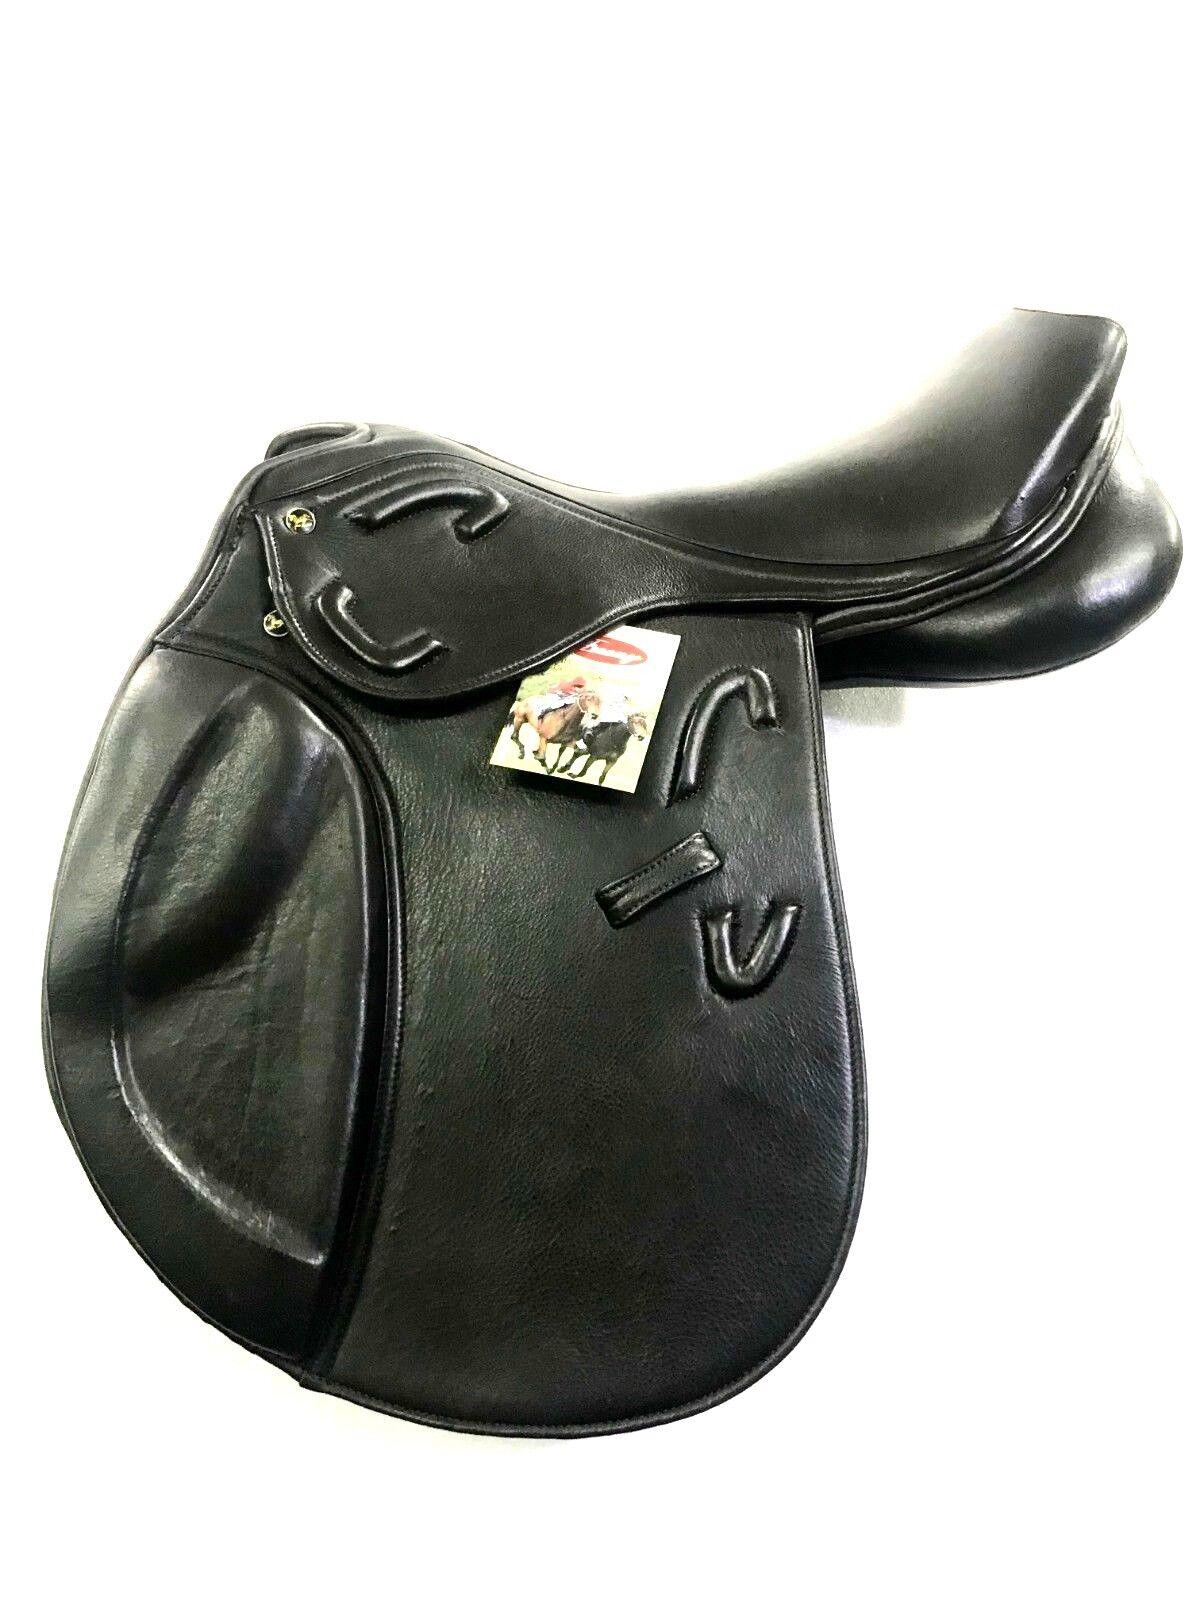 New Softy Padded Leather English  All Purpose Saddle